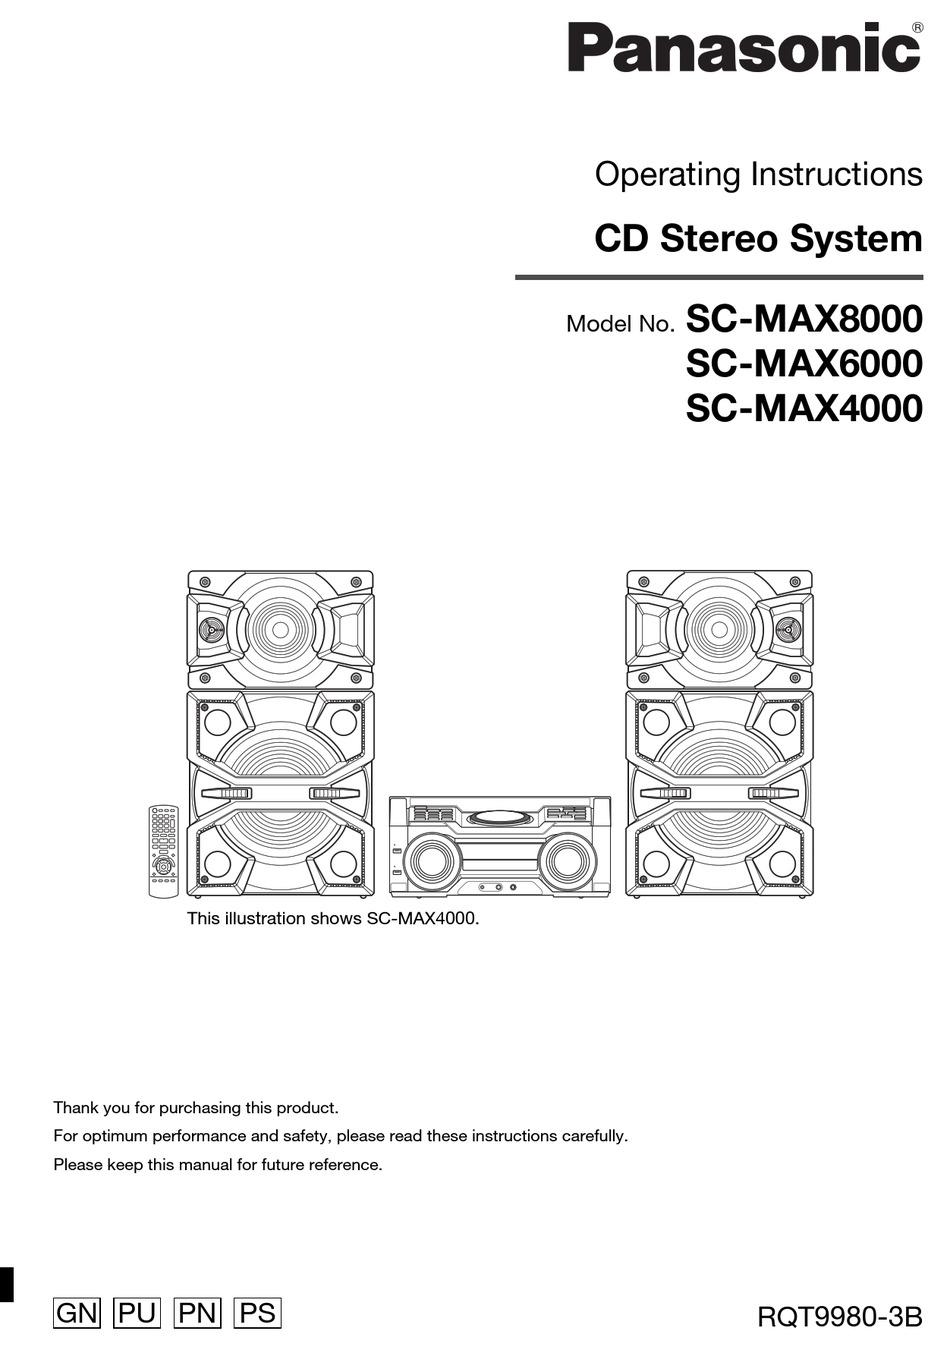 PANASONIC SC-MAX8000 OPERATING INSTRUCTIONS MANUAL Pdf